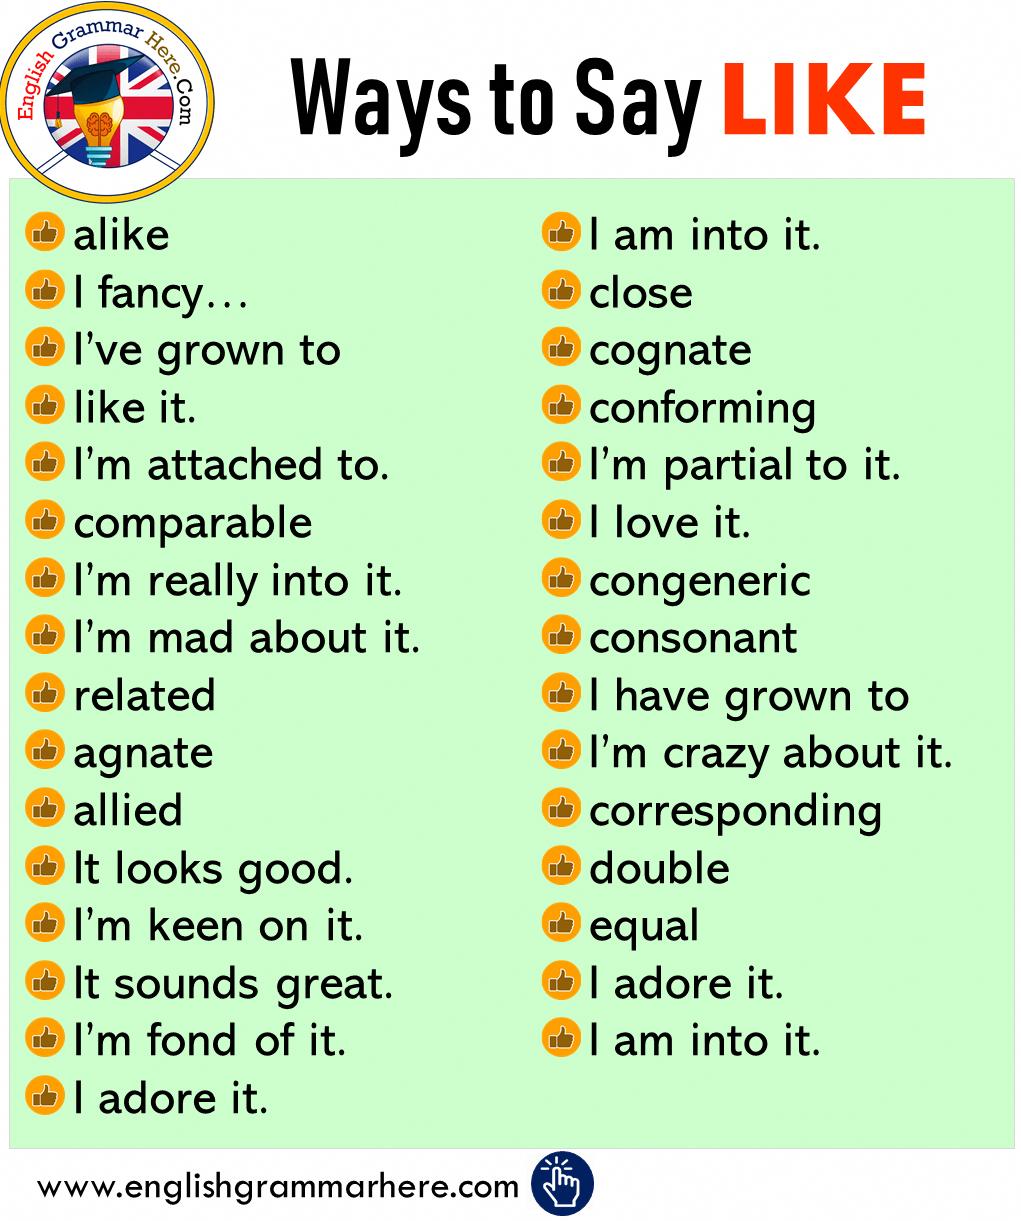 Different Ways To Say Like In English Apprendreanglais Apprendreanglaisenfant Anglaisfacile Coursanglais English Writing Skills English Phrases Learn English